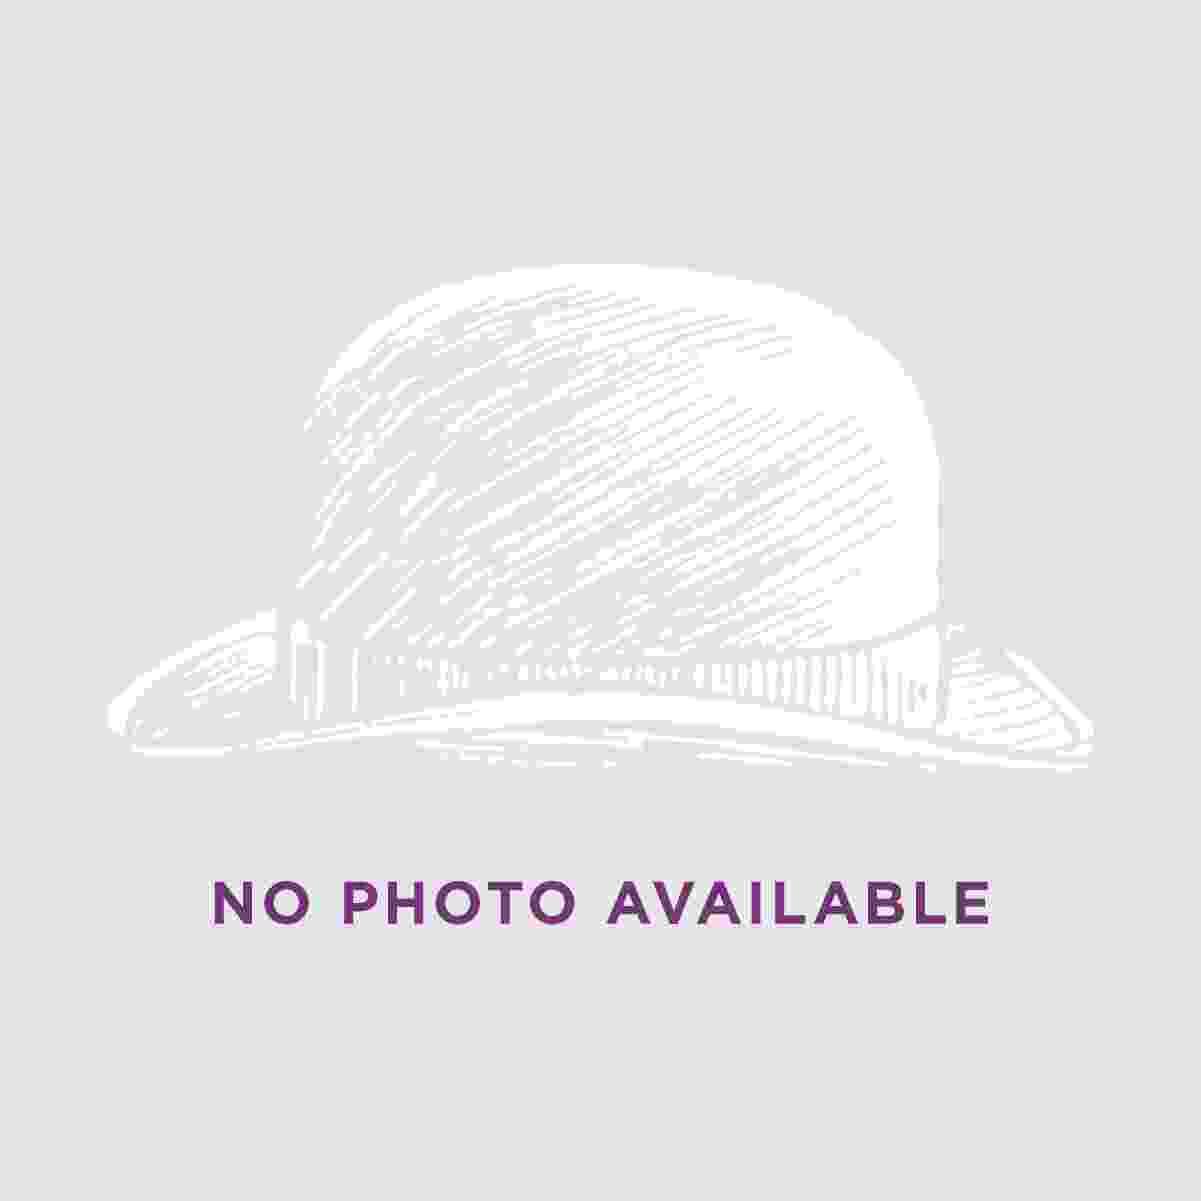 1d032ad6700 Greek Fisherman Hats and Caps - Village Hat Shop